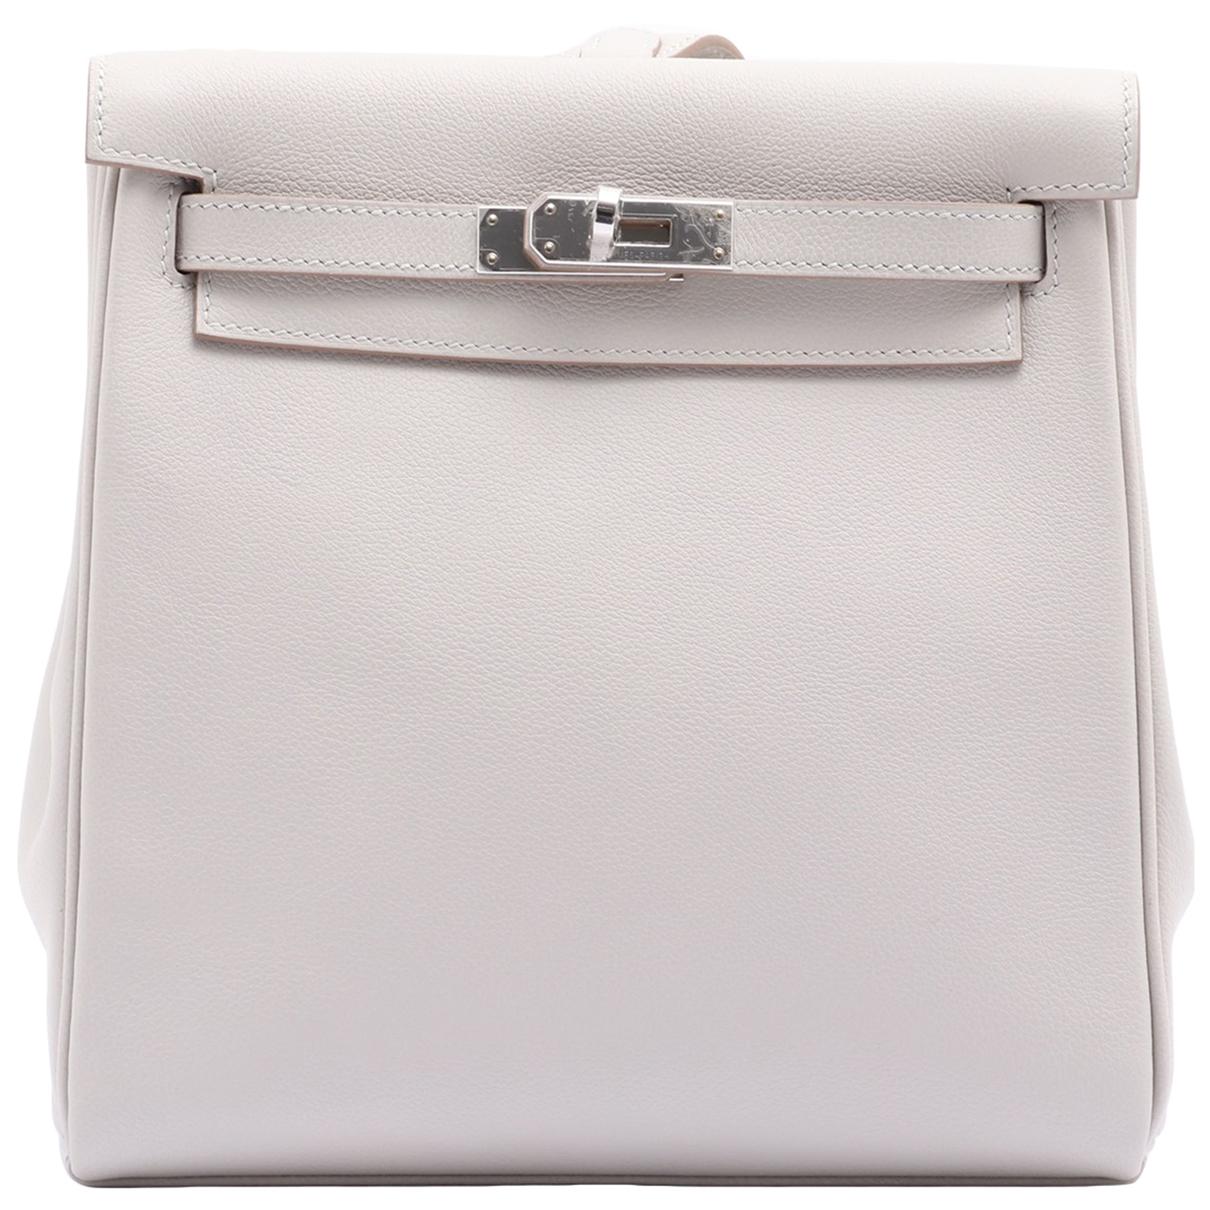 Hermès Kellyado White Leather handbag for Women N